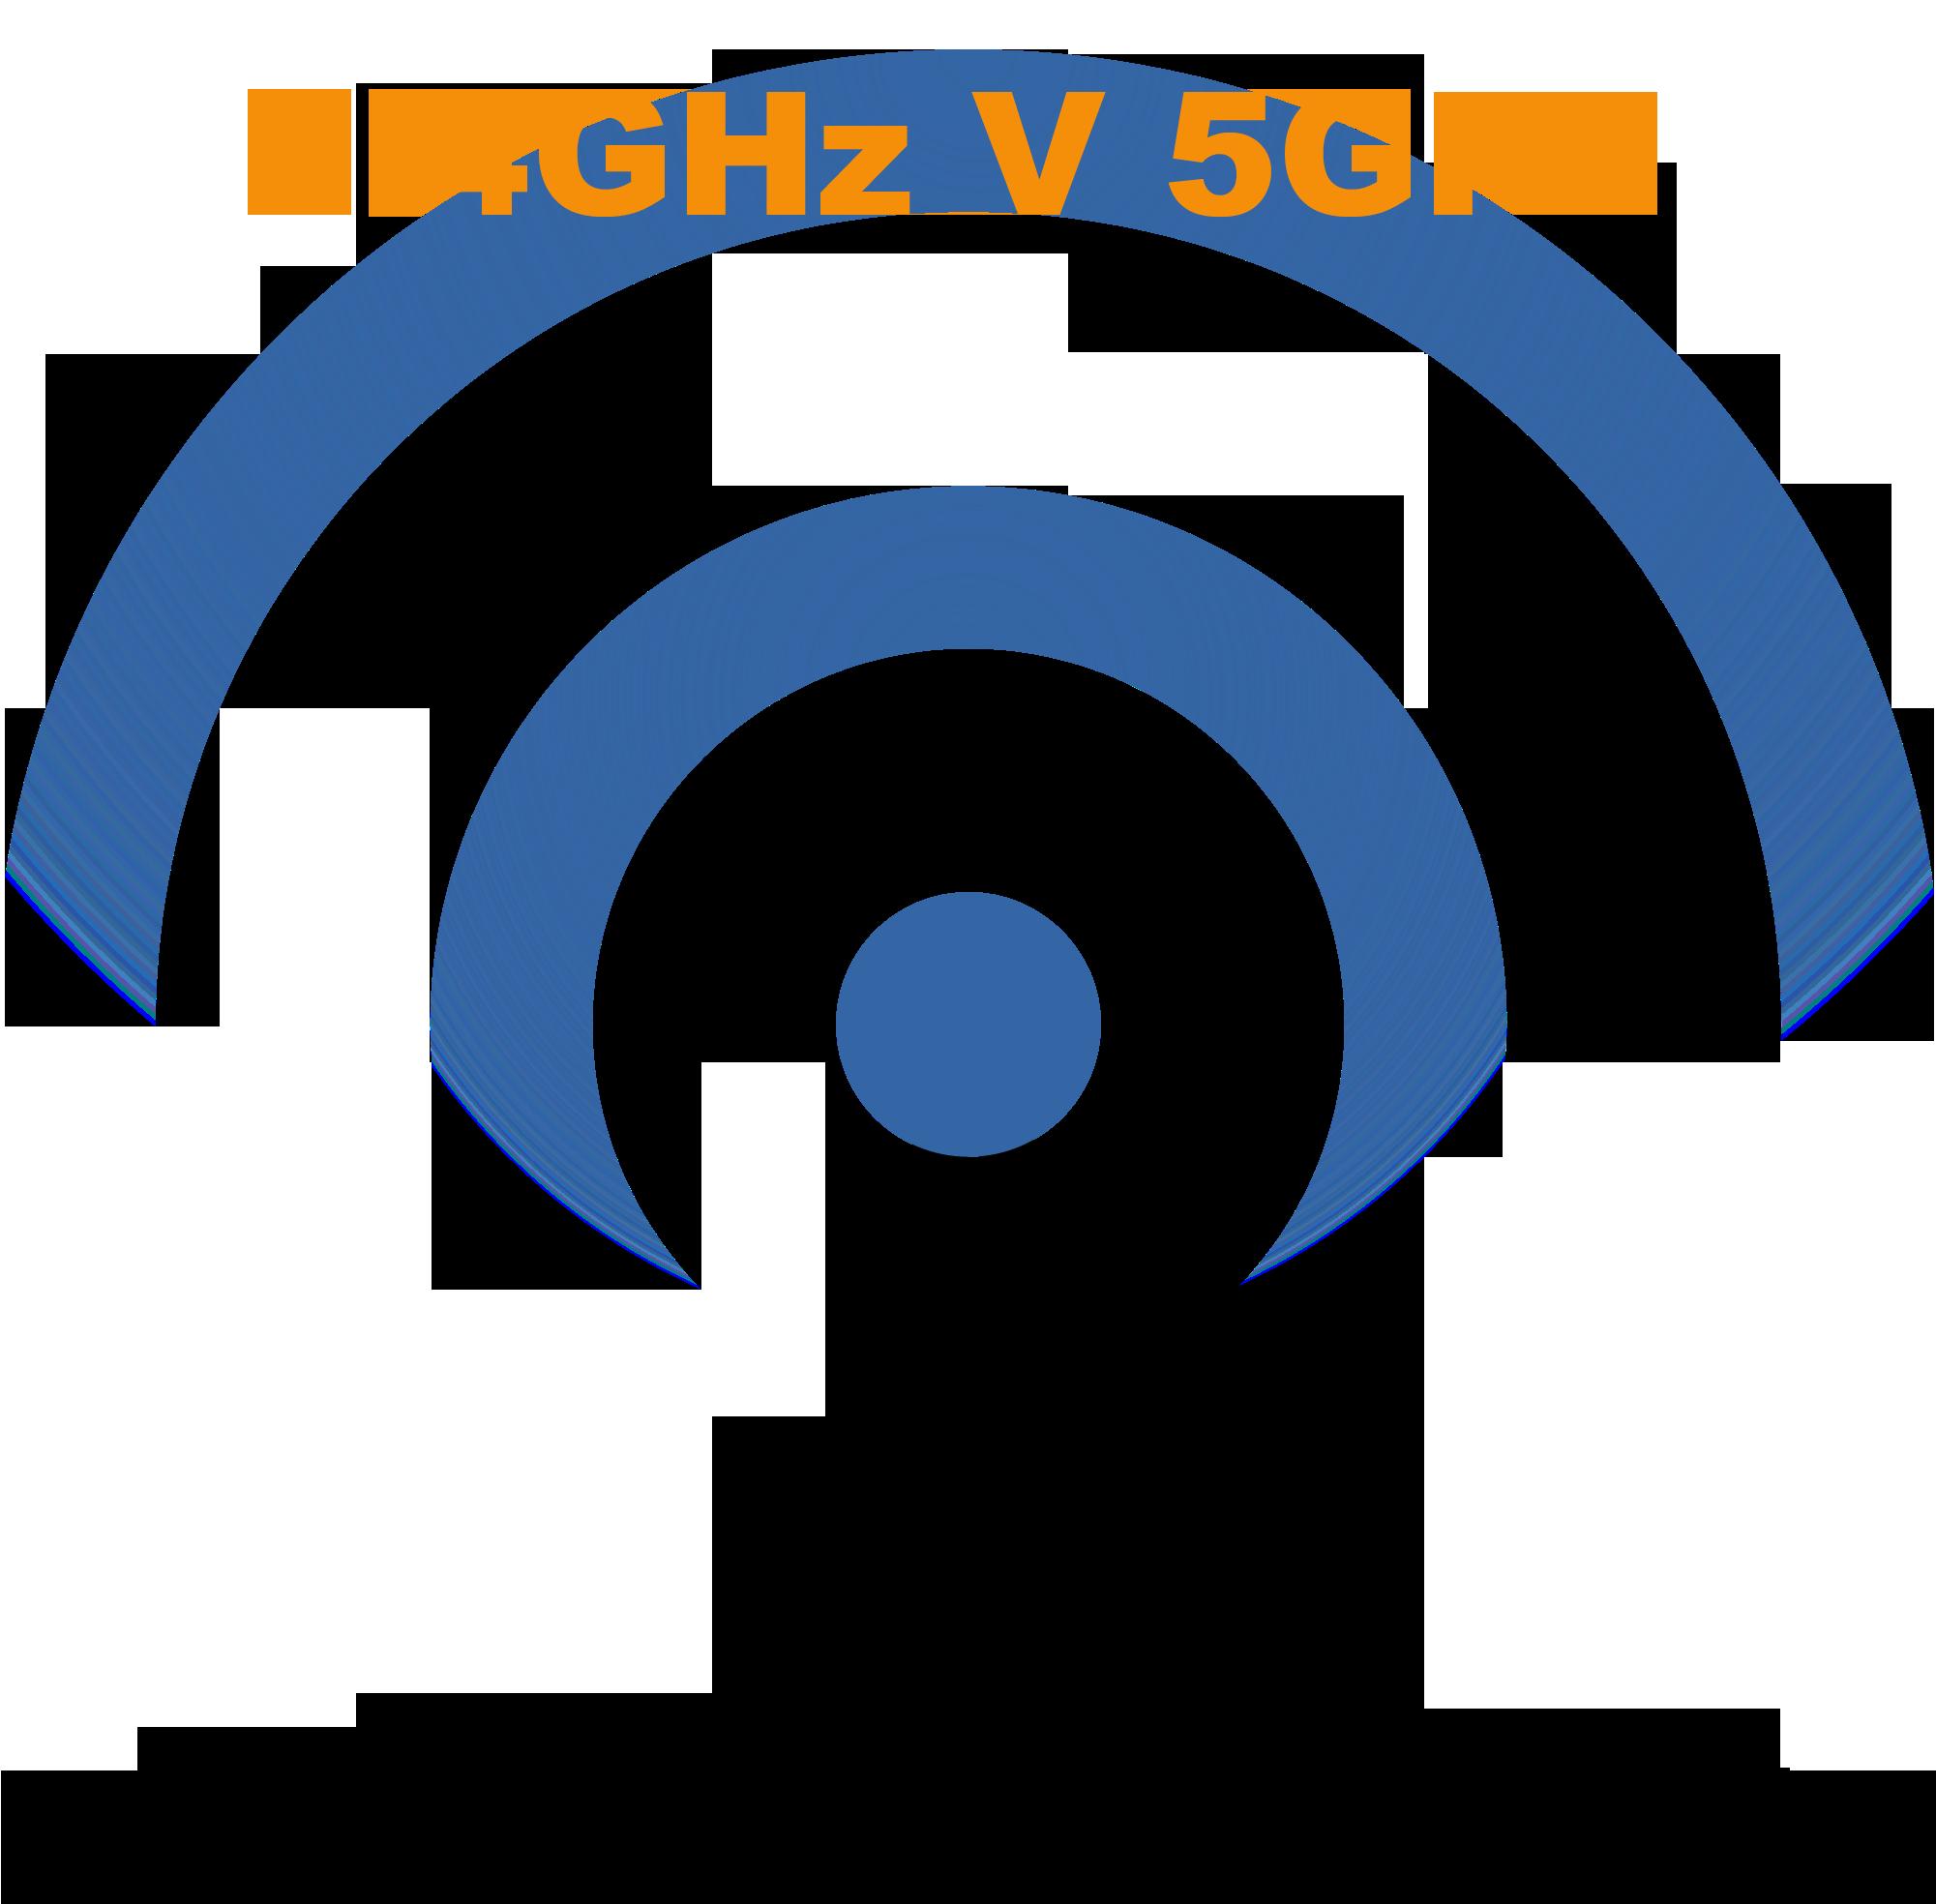 2.4GHz v 5GHz